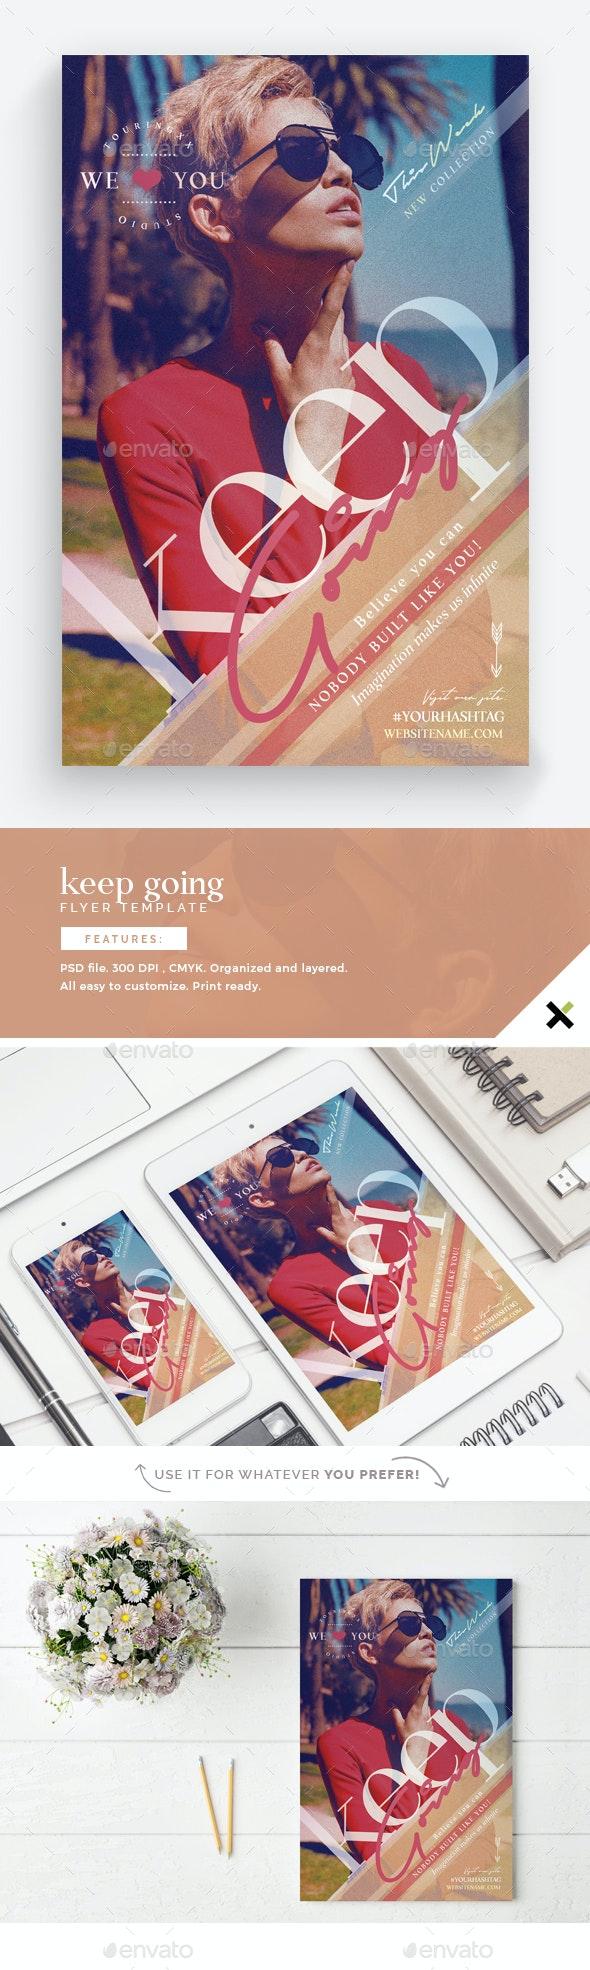 Keep Going Flyer Template - Flyers Print Templates